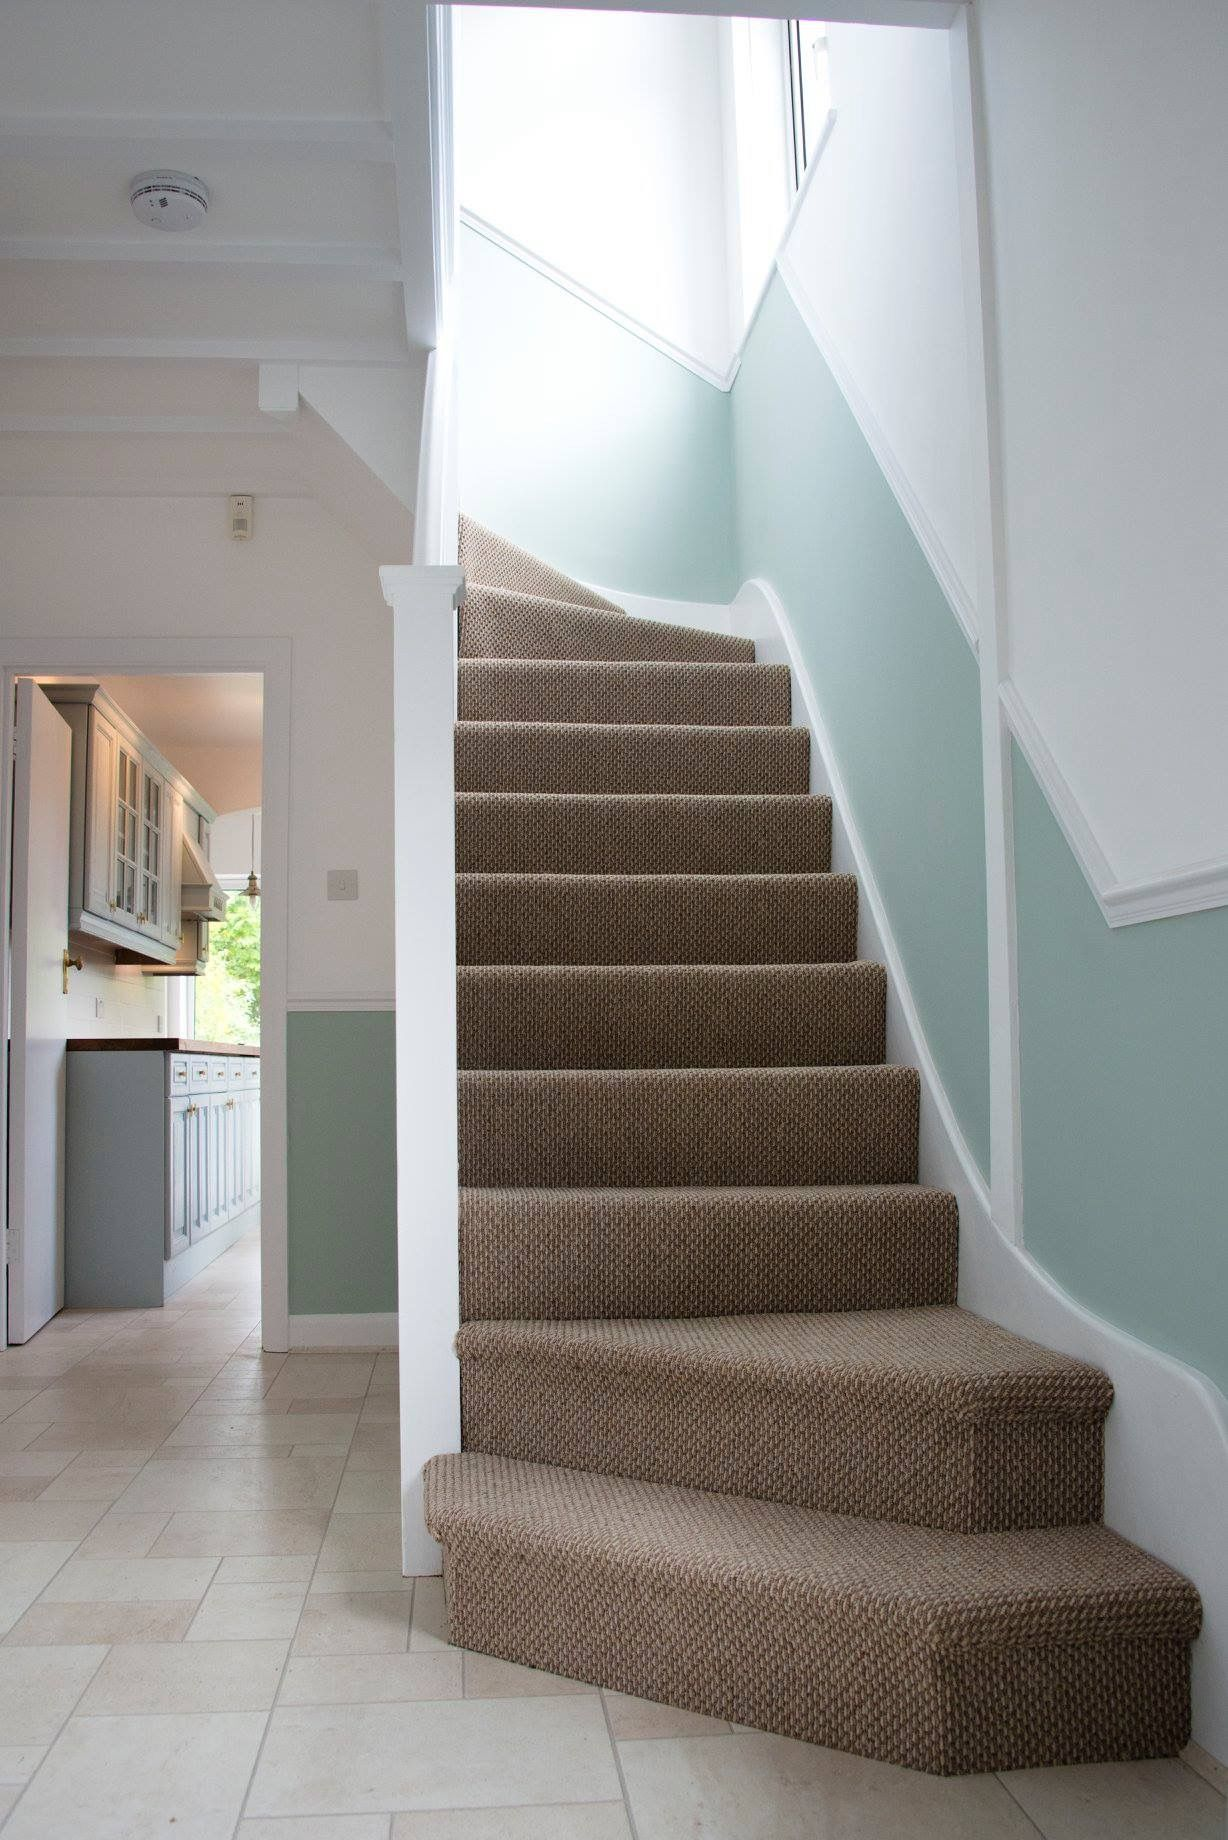 hallway flooring by quickstep exquisa 1553 dado rail. Black Bedroom Furniture Sets. Home Design Ideas